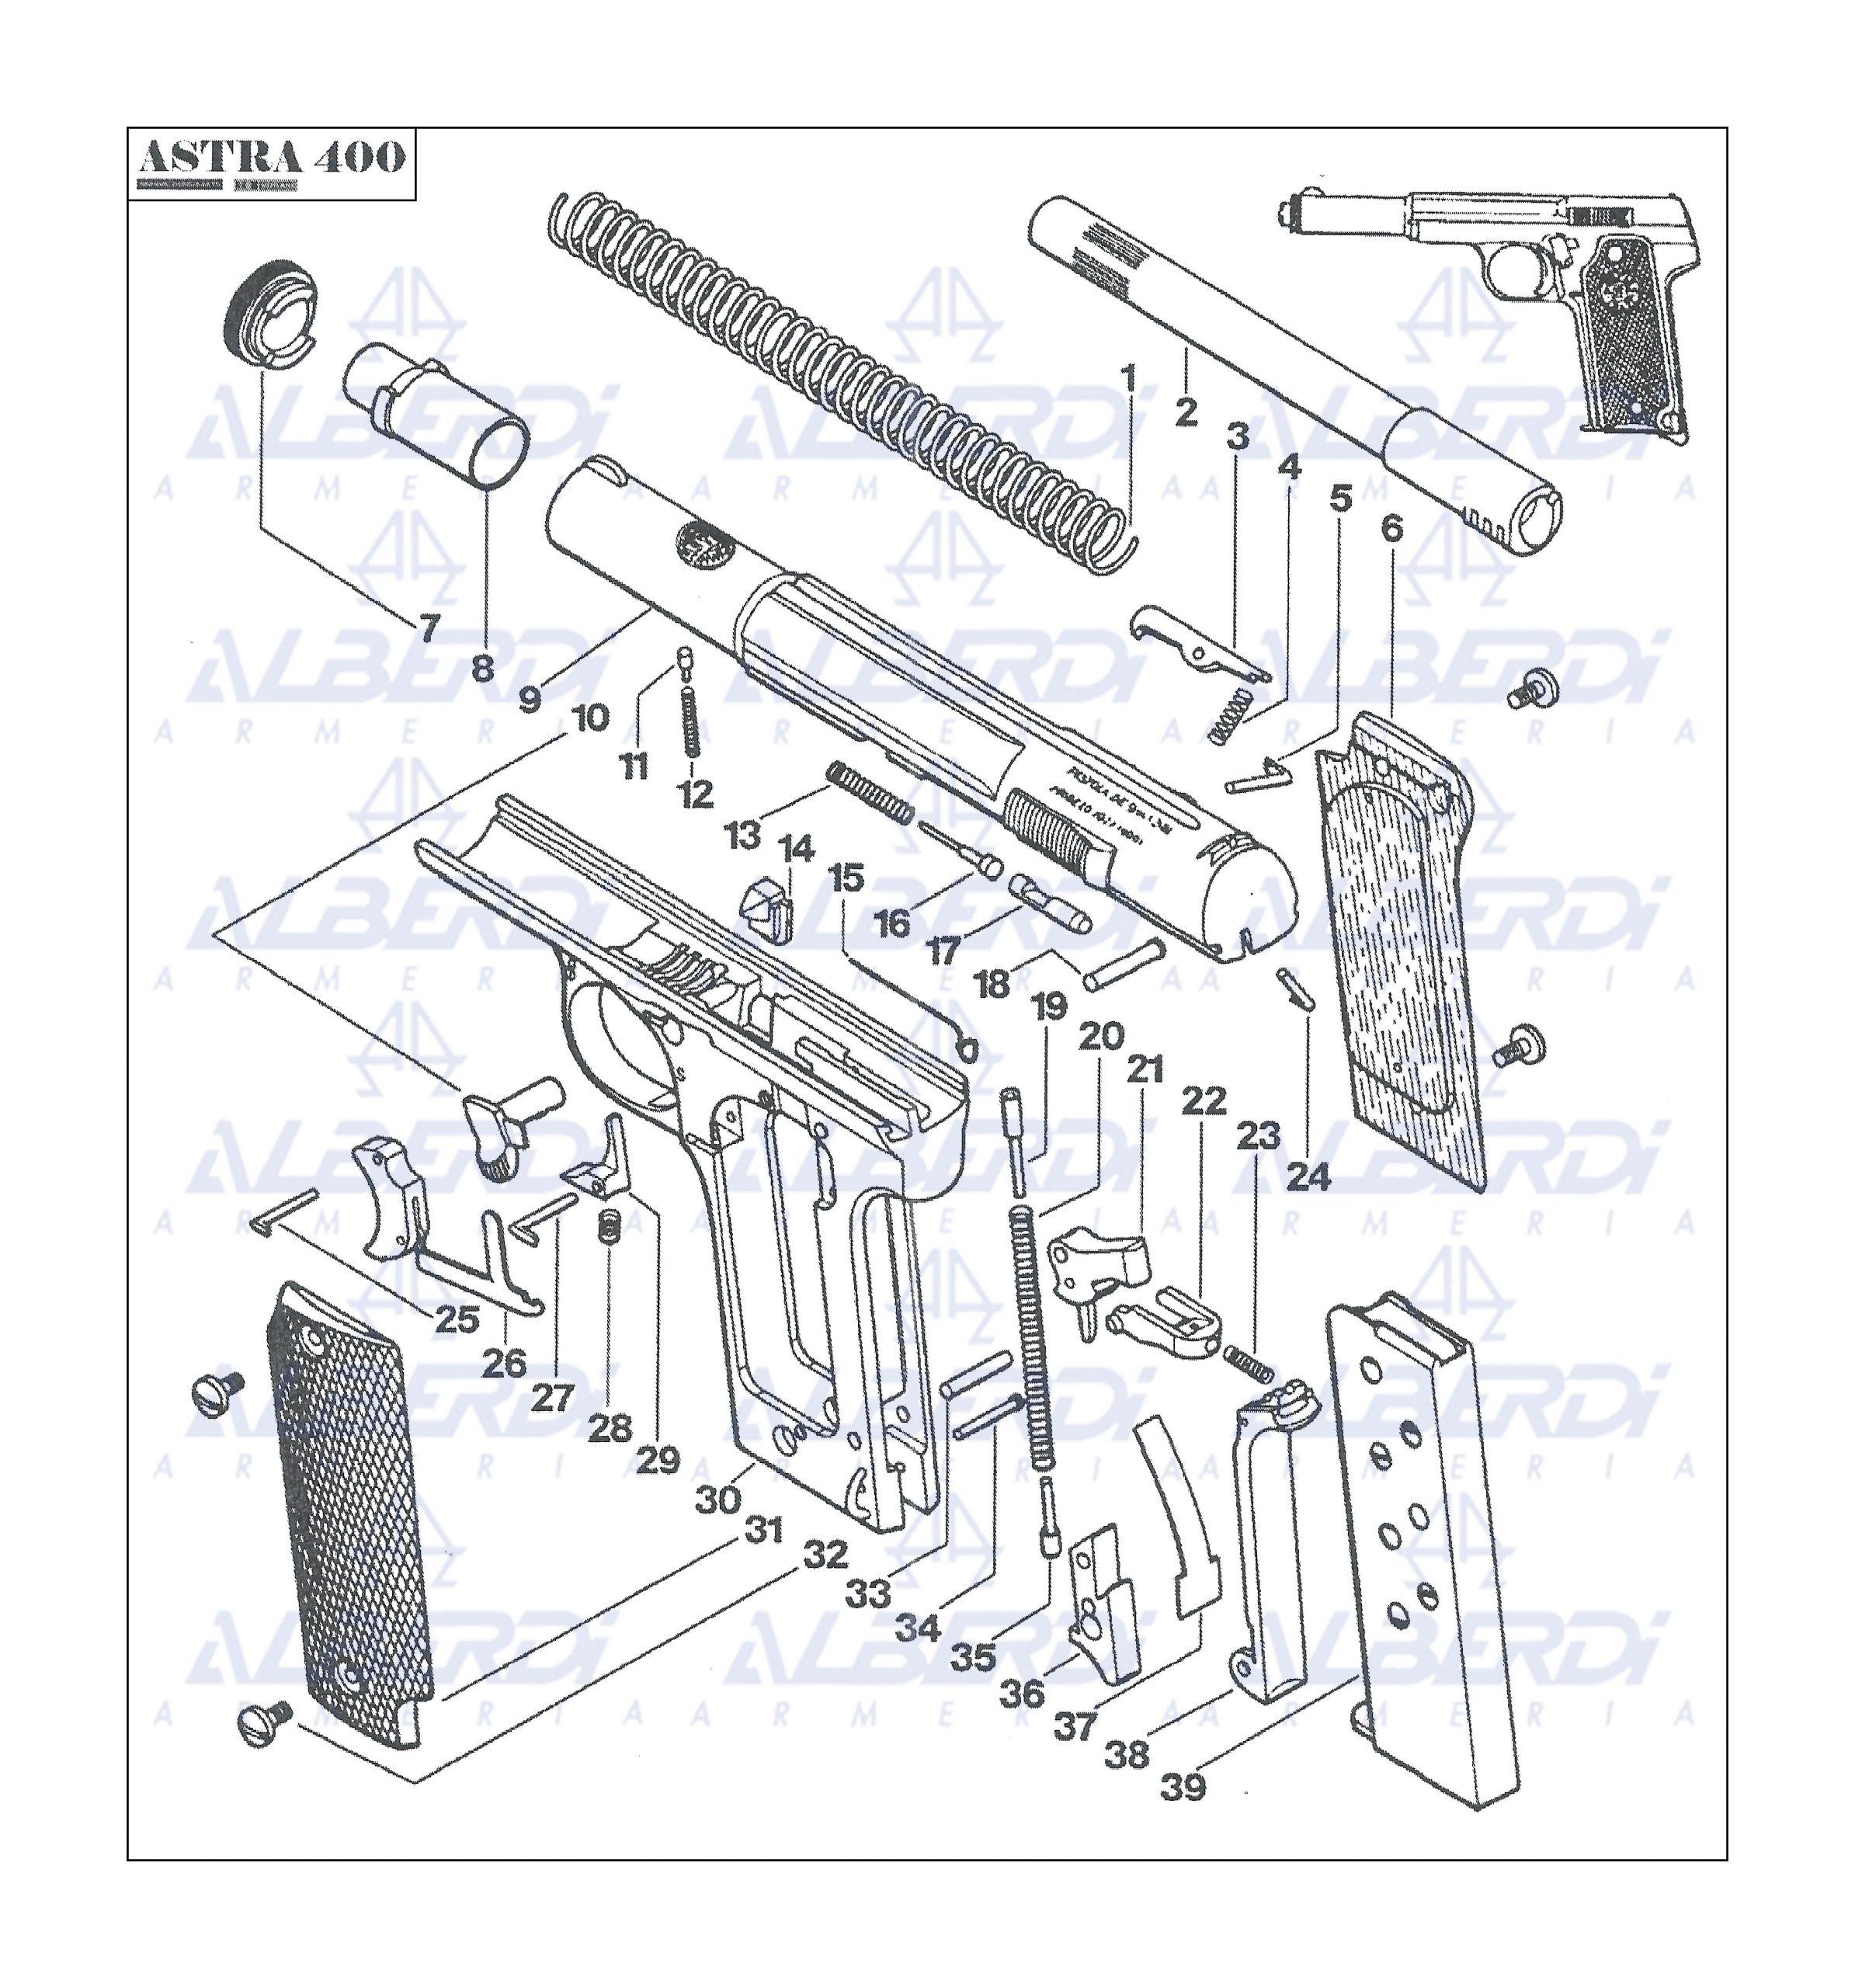 Astra modelo 400 9mm. largo 001 Agua